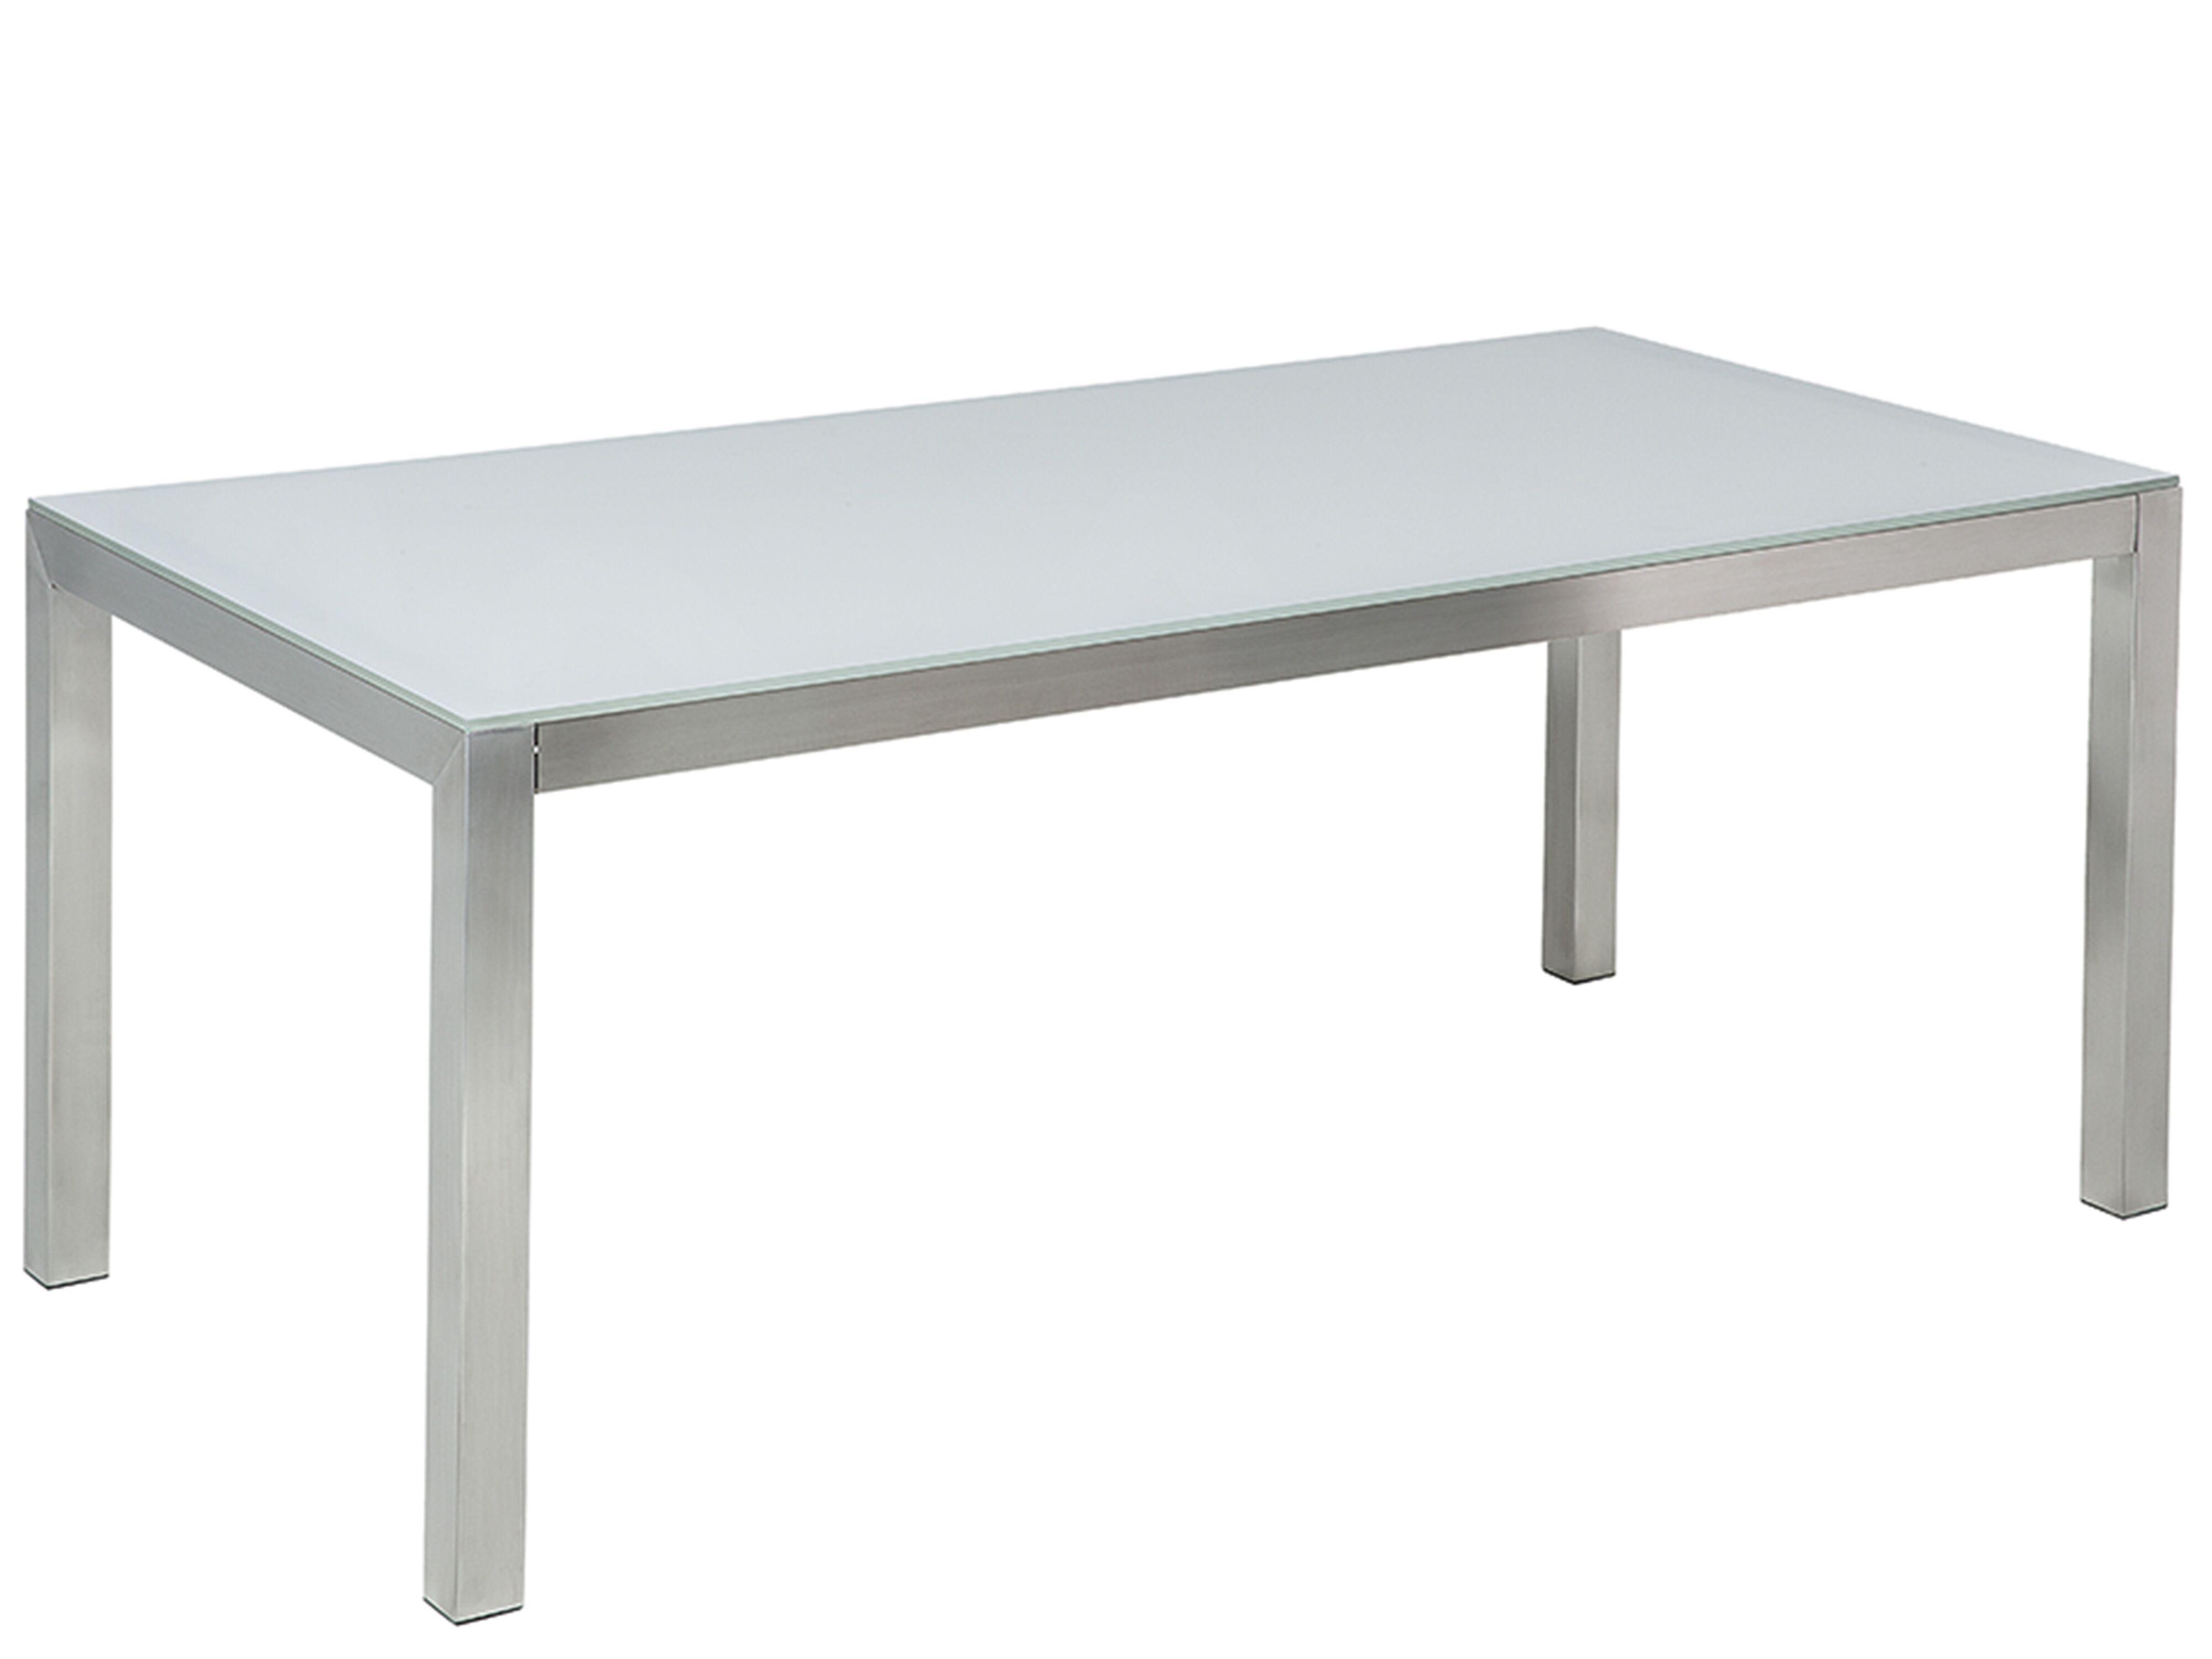 Garden Dining Table Glass Top 9 x 9 cm White GROSSETO   Beliani.de